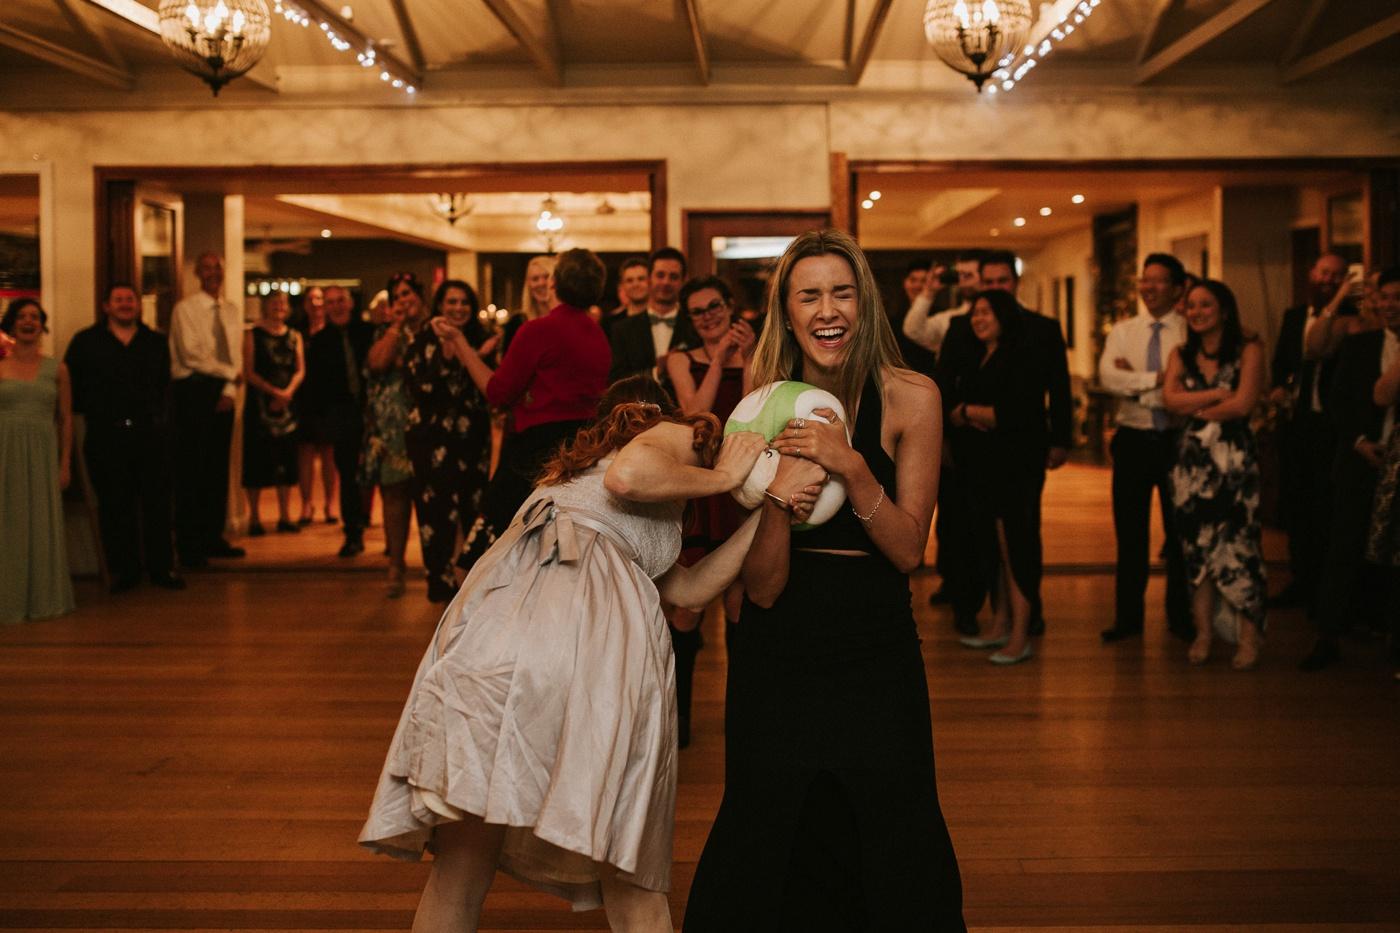 Emma&Morgan_Melbourne-Vintage-Elegant-Fun-Quirky-Yarra-Valley-Vineyard-Wedding_Melbourne-Wedding-Photography-110